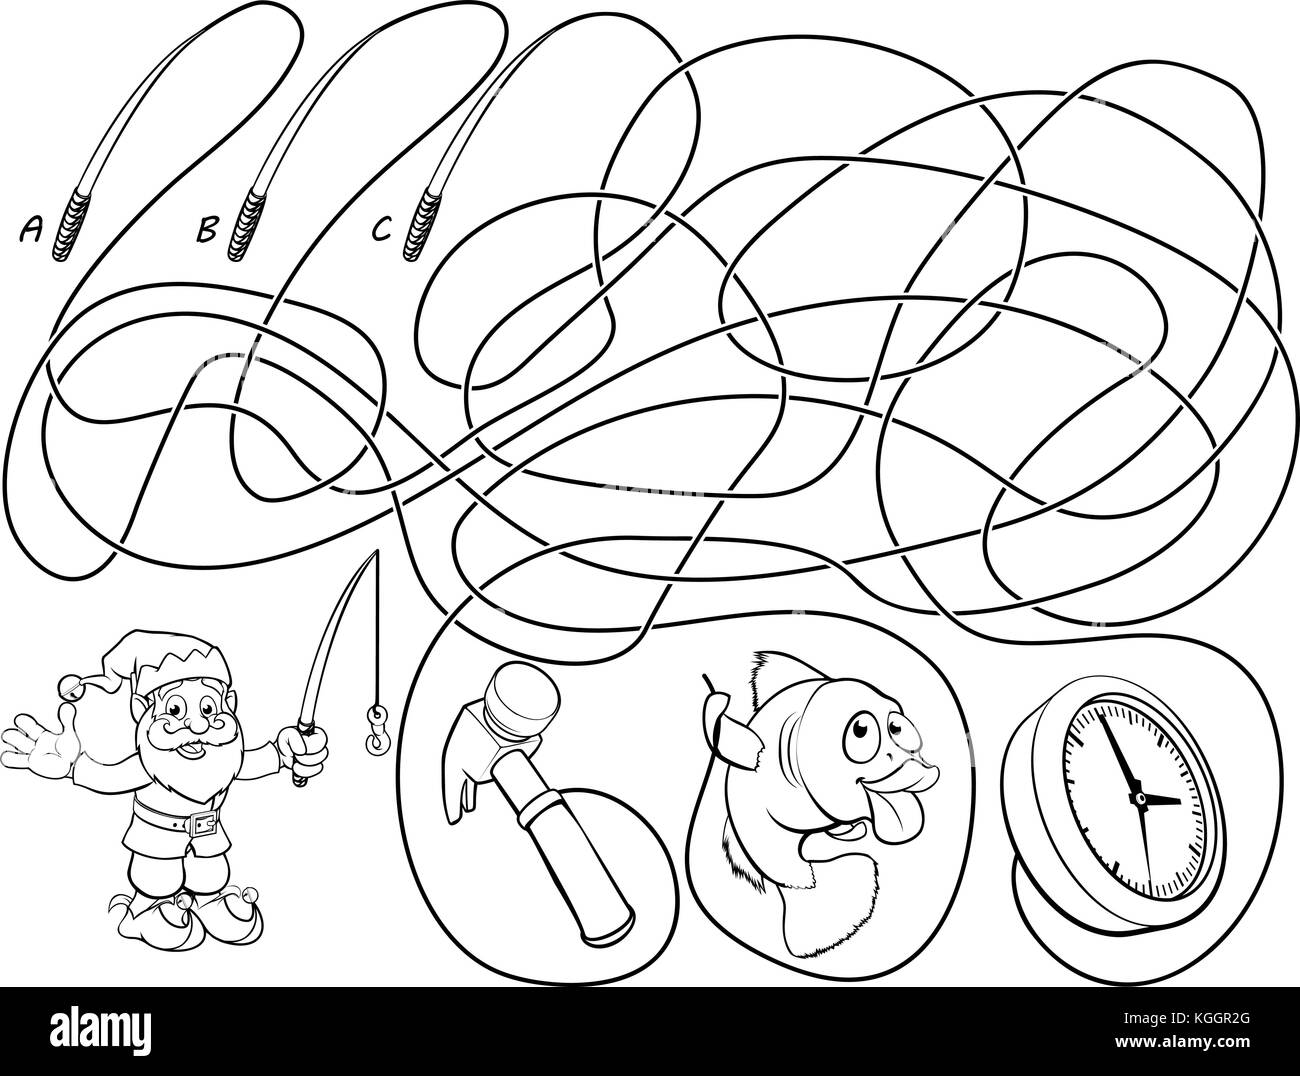 Cartoon Illustration Education Maze Labyrinth Stock Photos